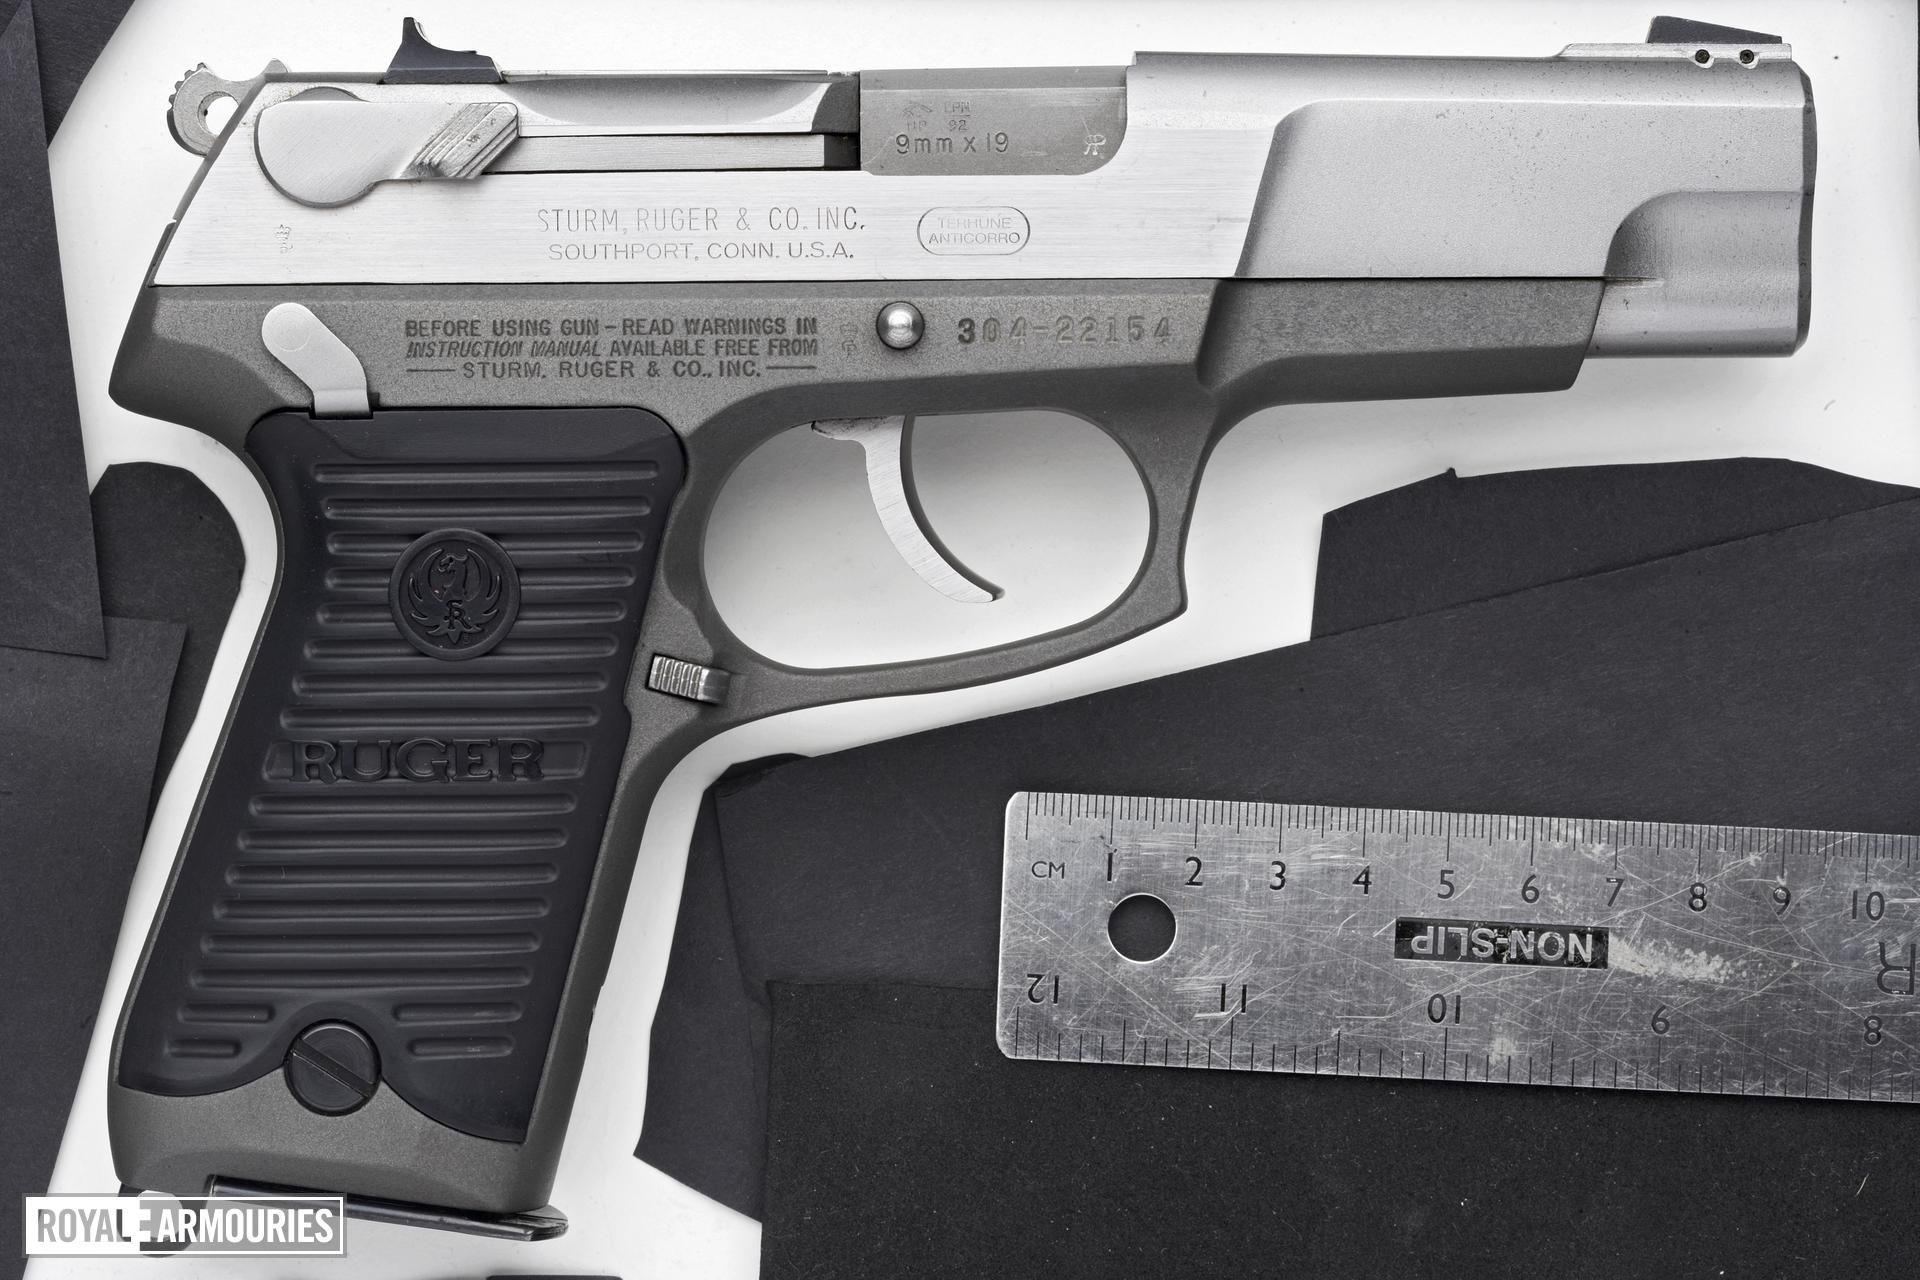 Centrefire self-loading pistol - Ruger P89